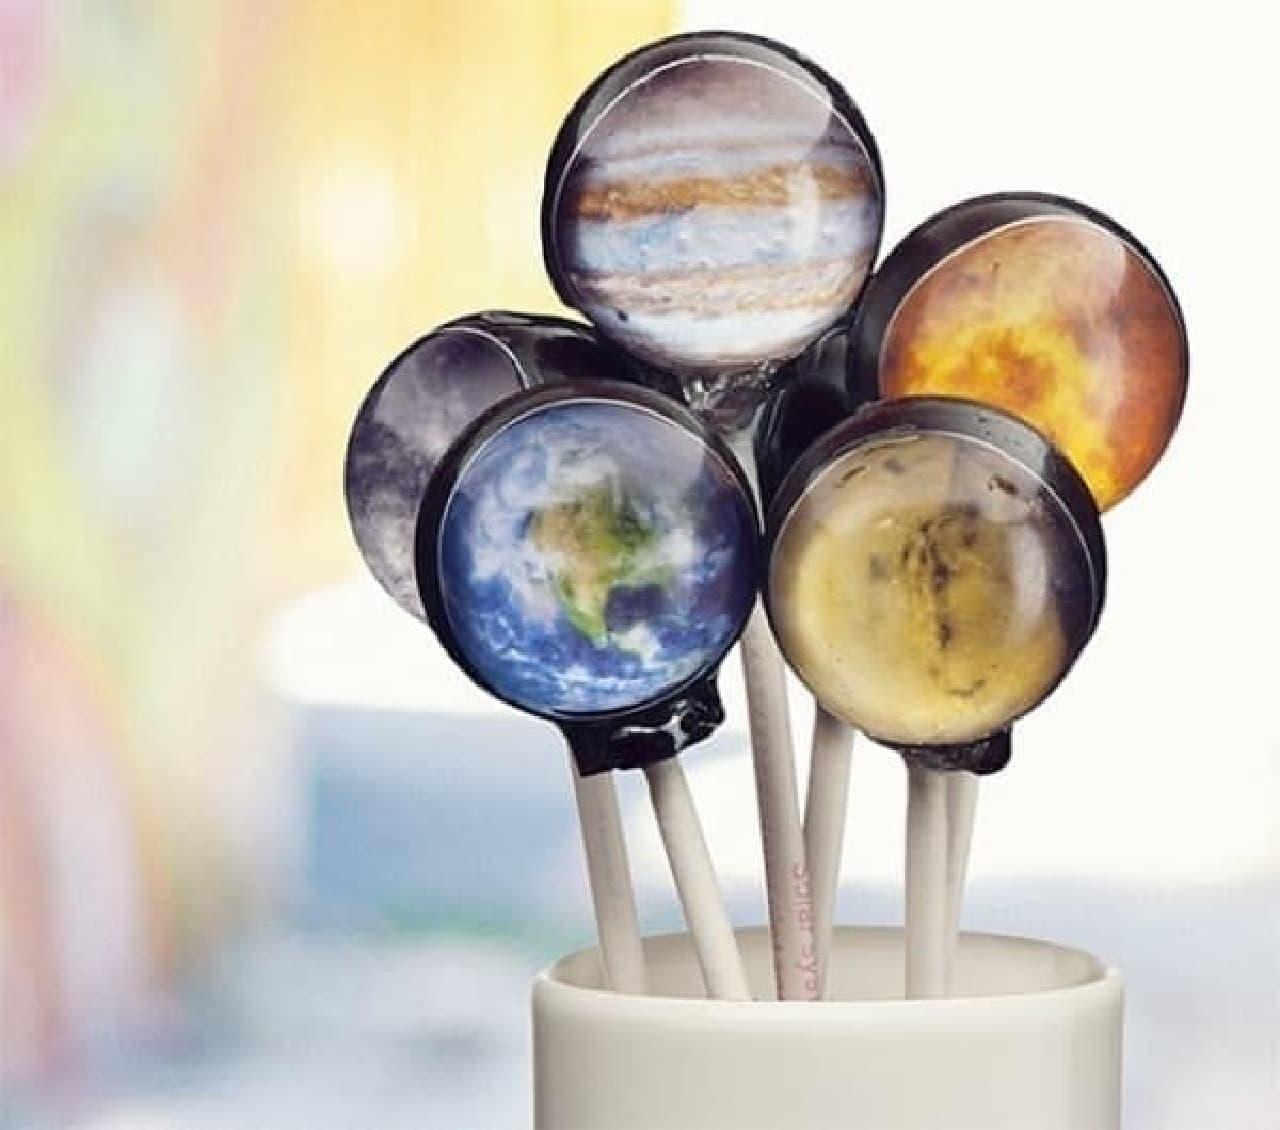 Vintage Confections 宇宙キャンディー